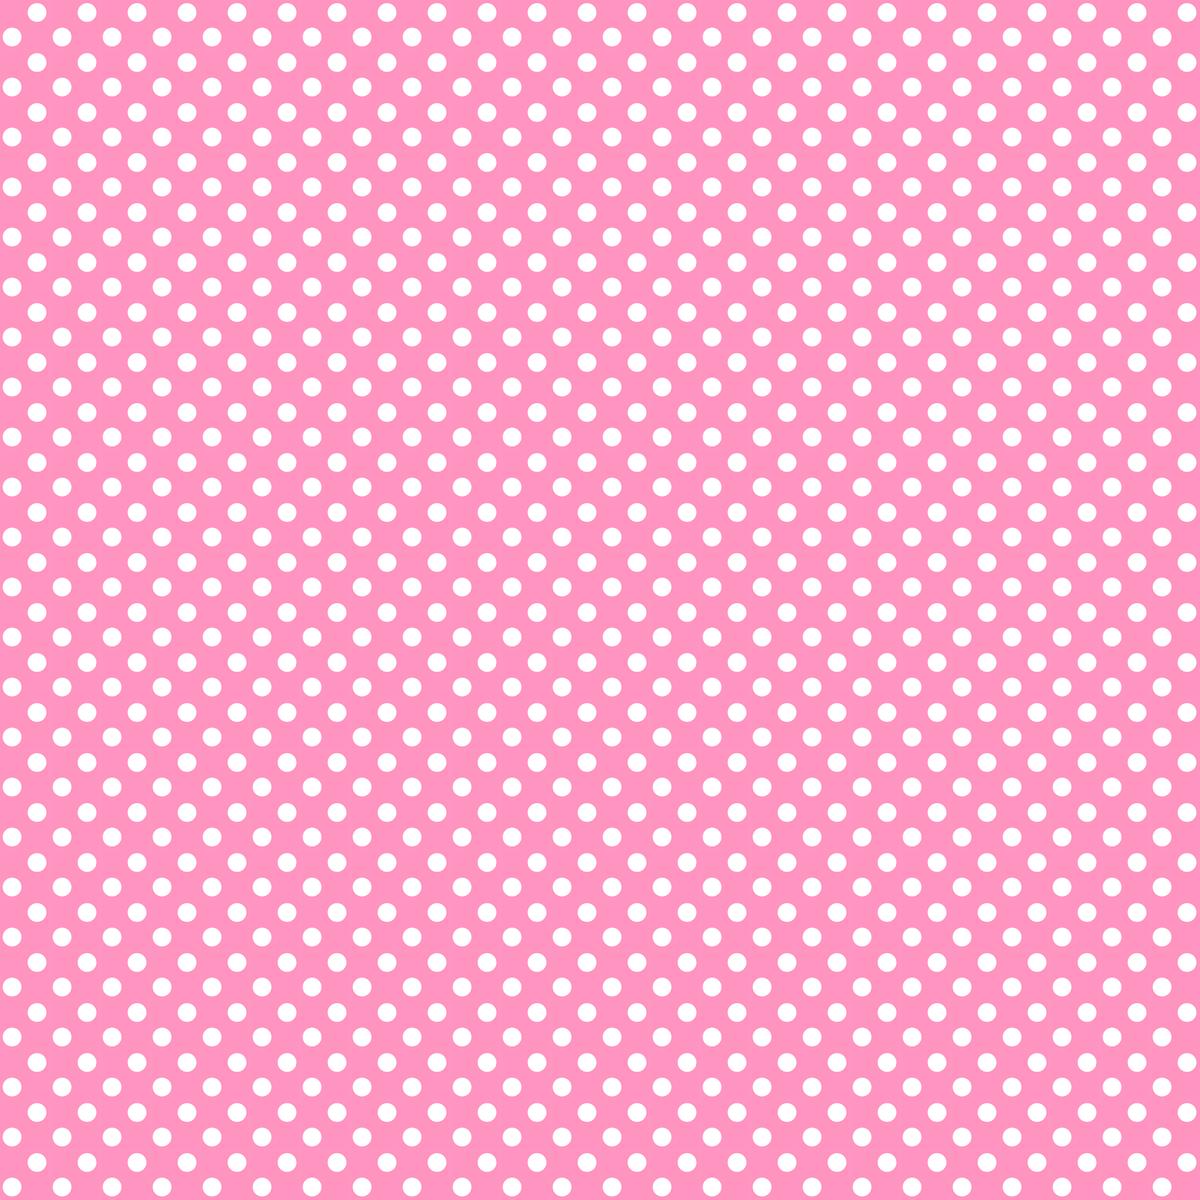 Pink Polka Dot Patterns free digital po...